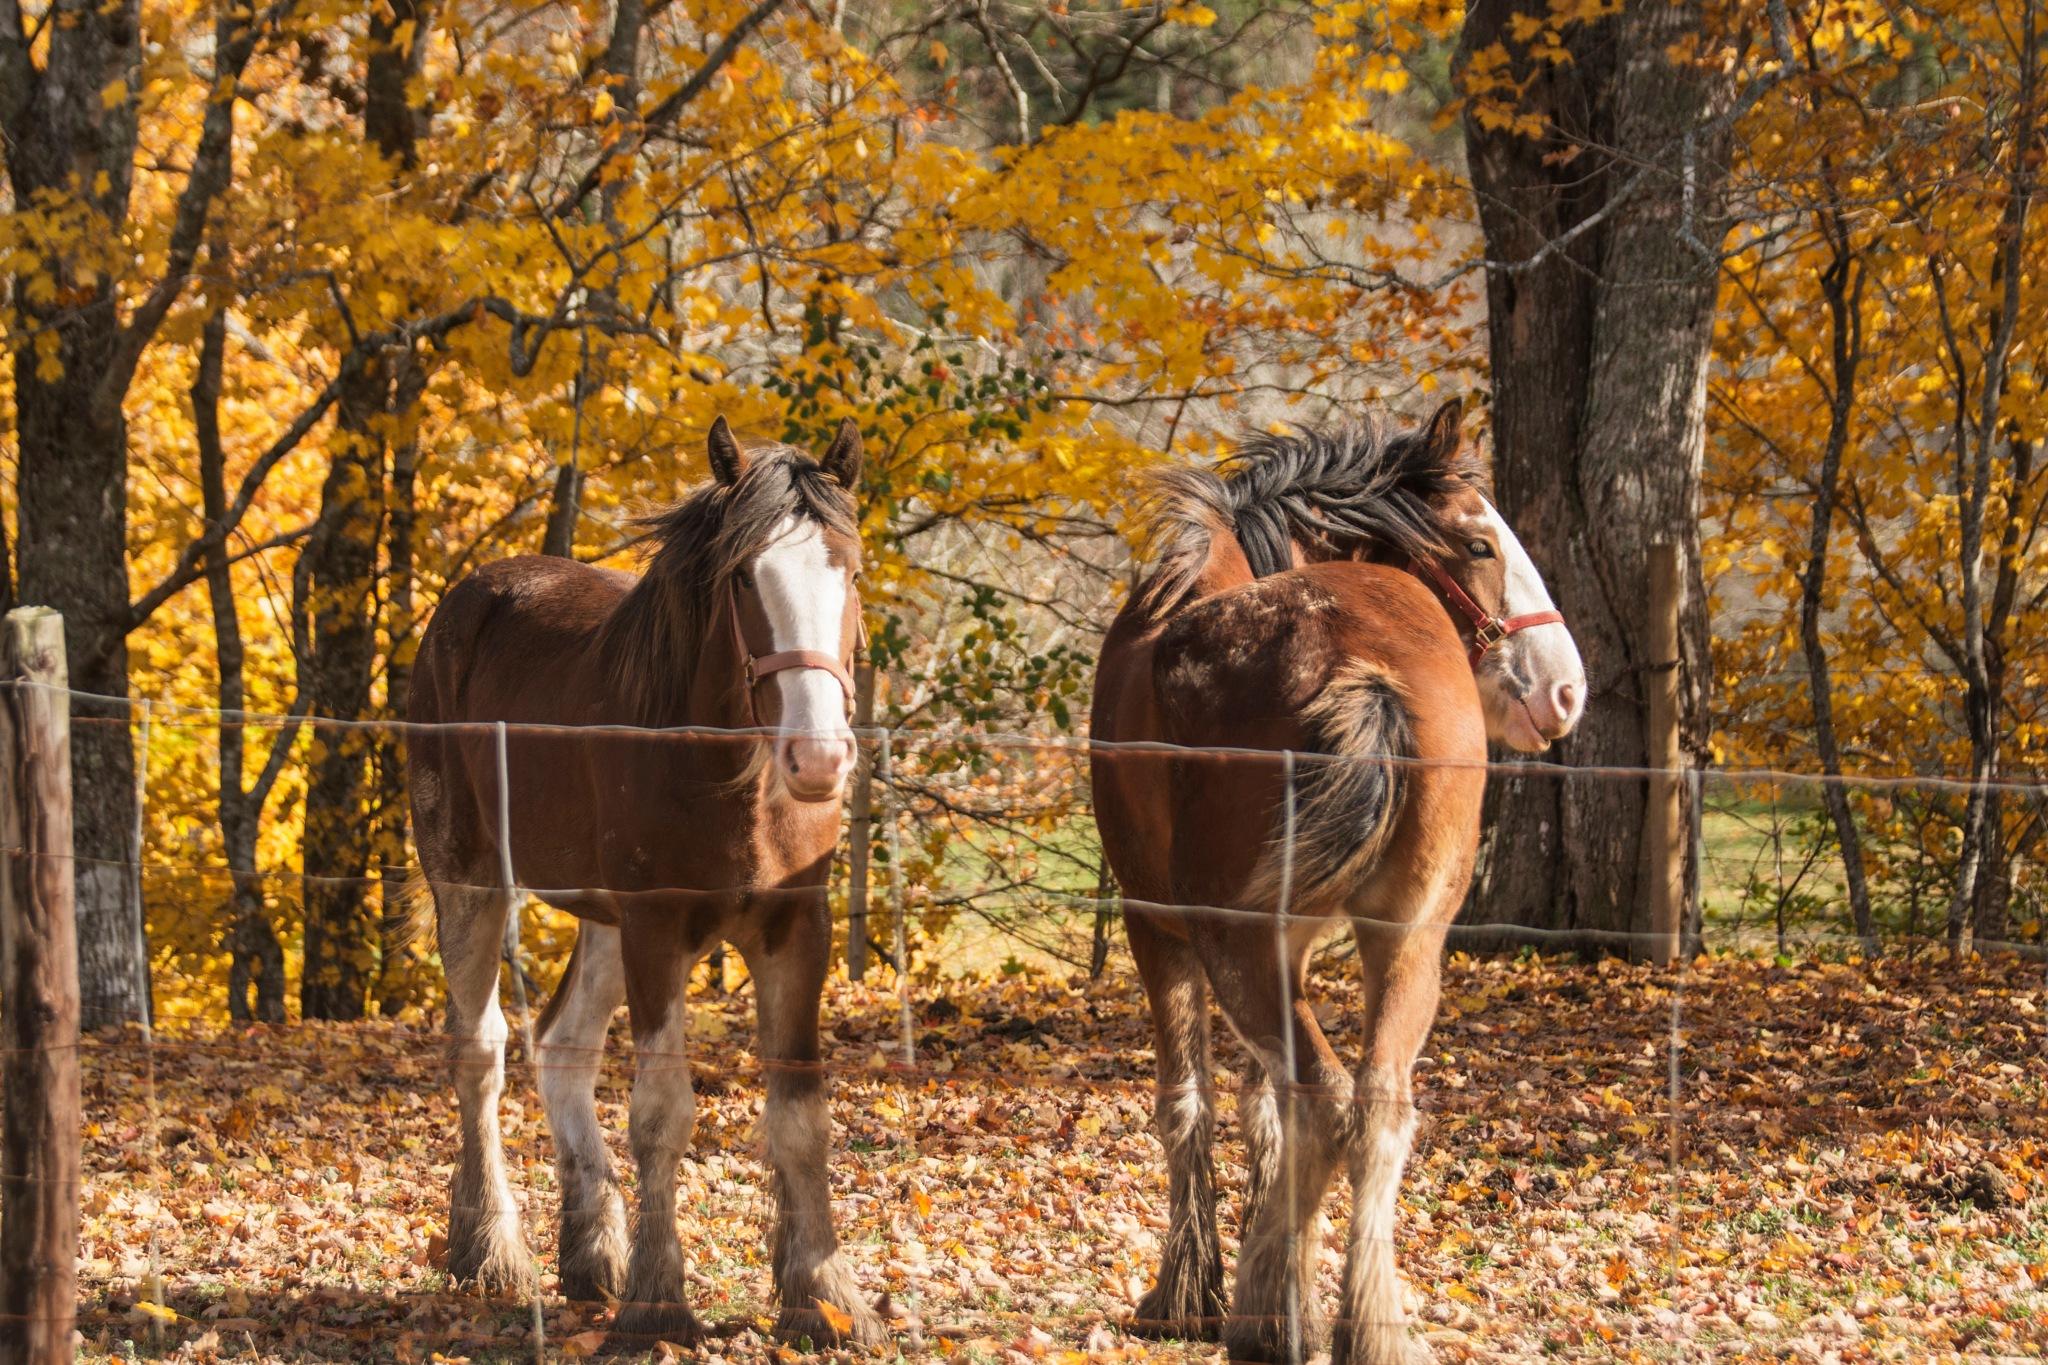 Enjoying the Last Days of Fall by Wayne L. Talbot